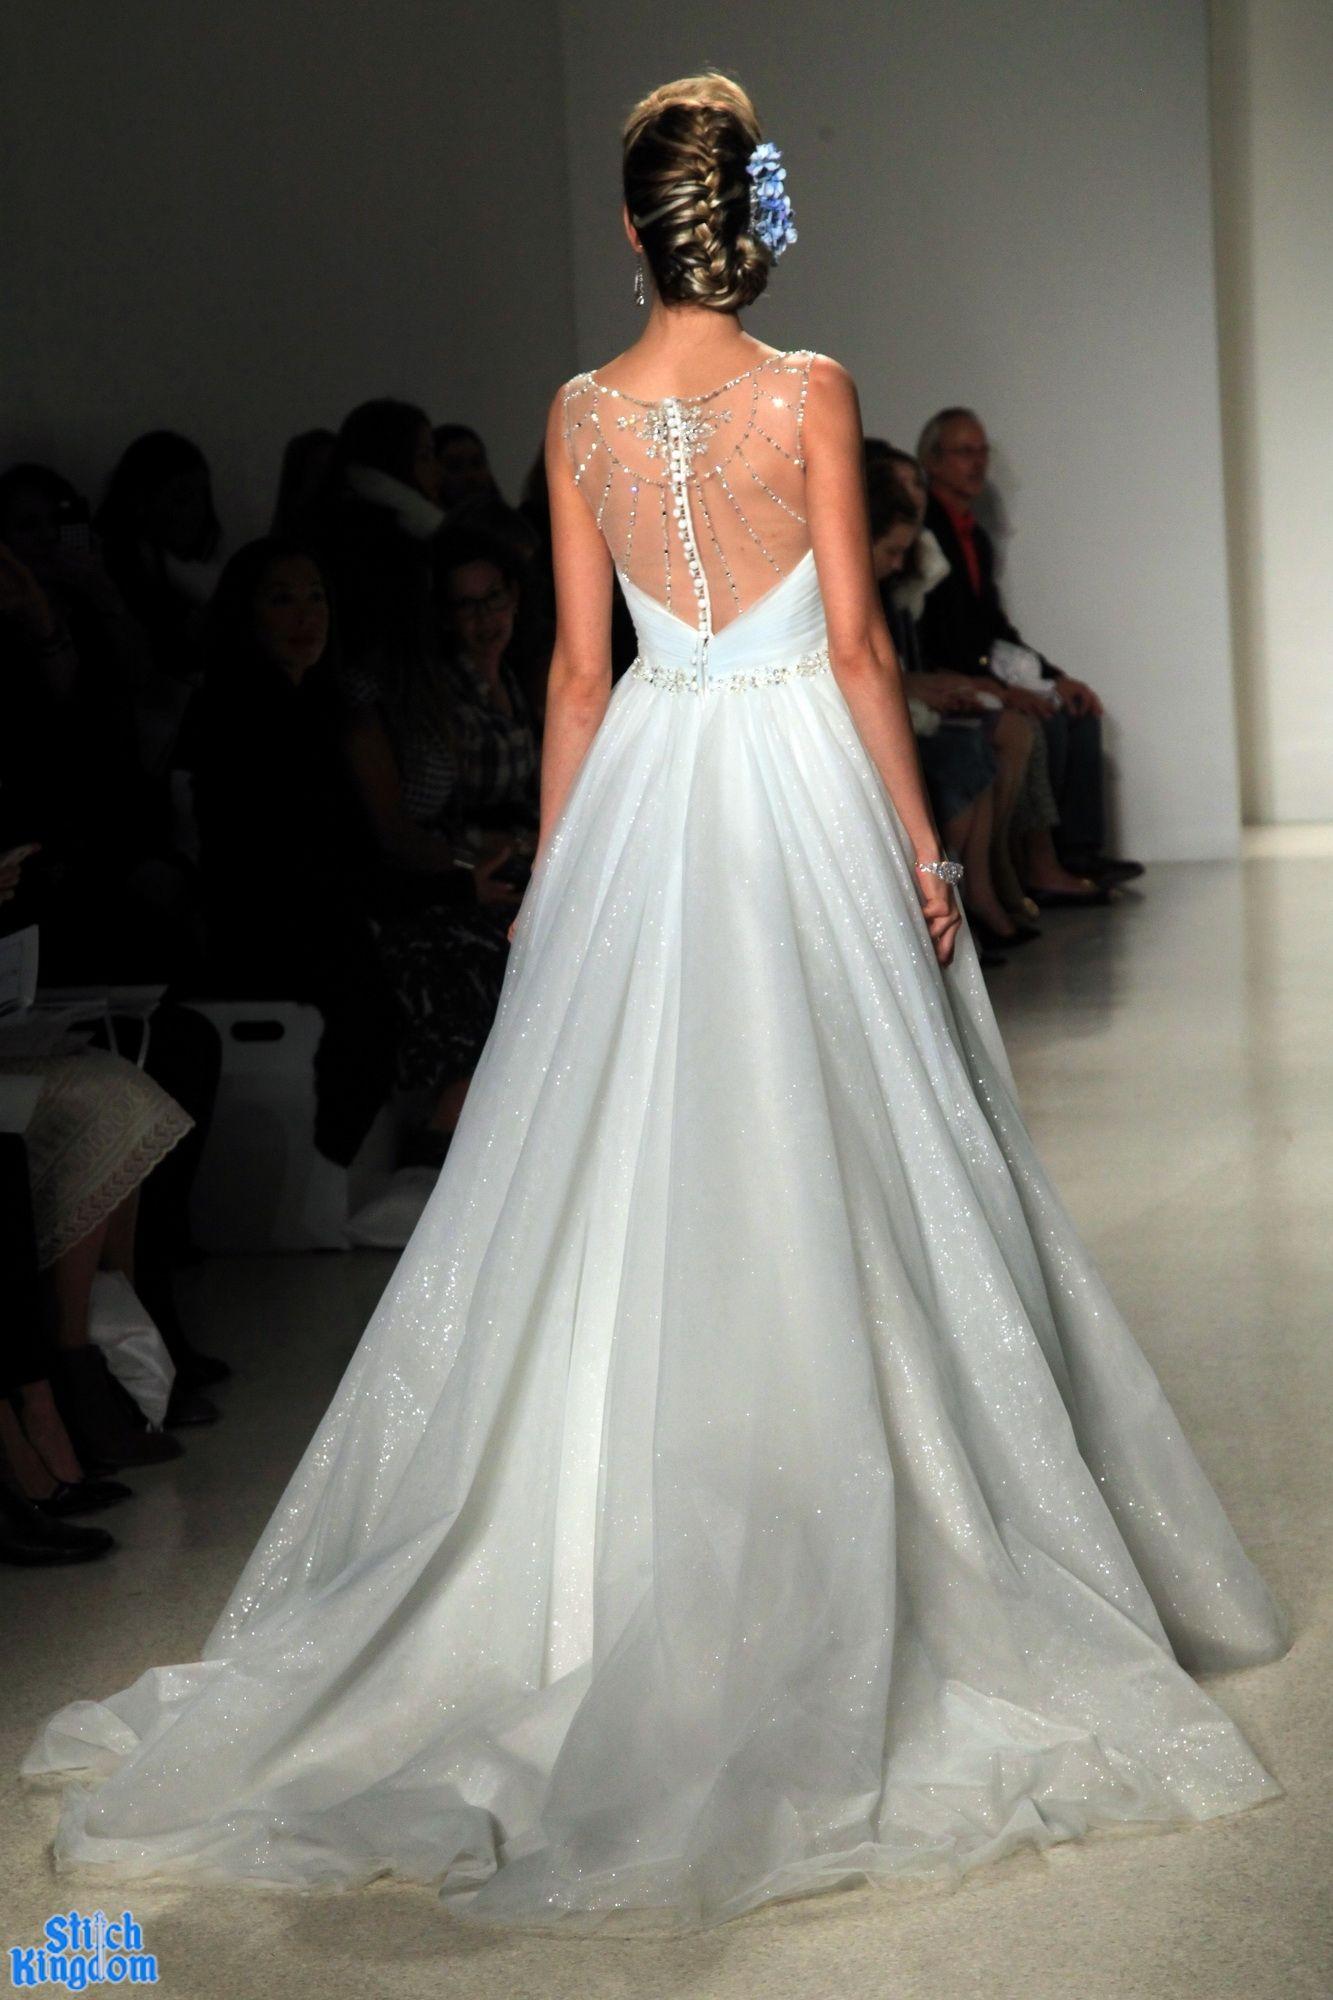 Bridal Wedding Gowns   Pinterest   Fairytale wedding dresses ...